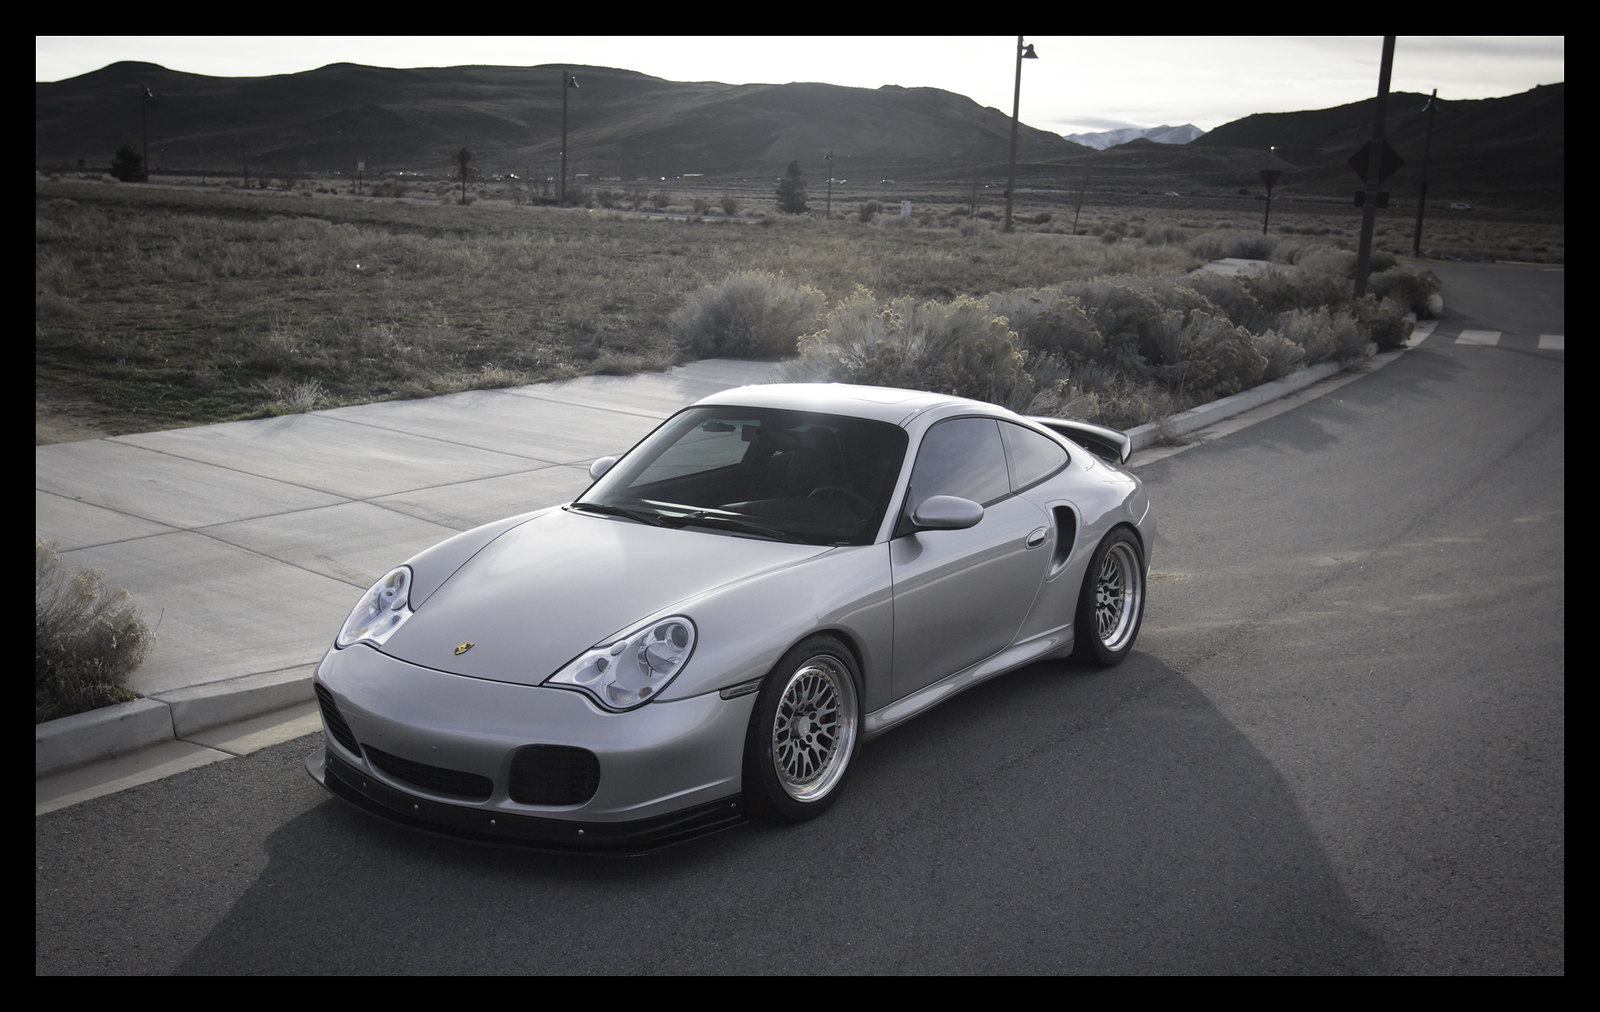 Used Cars Reno Nv >> Does anyone run Forgestar m14 wheels? - Page 3